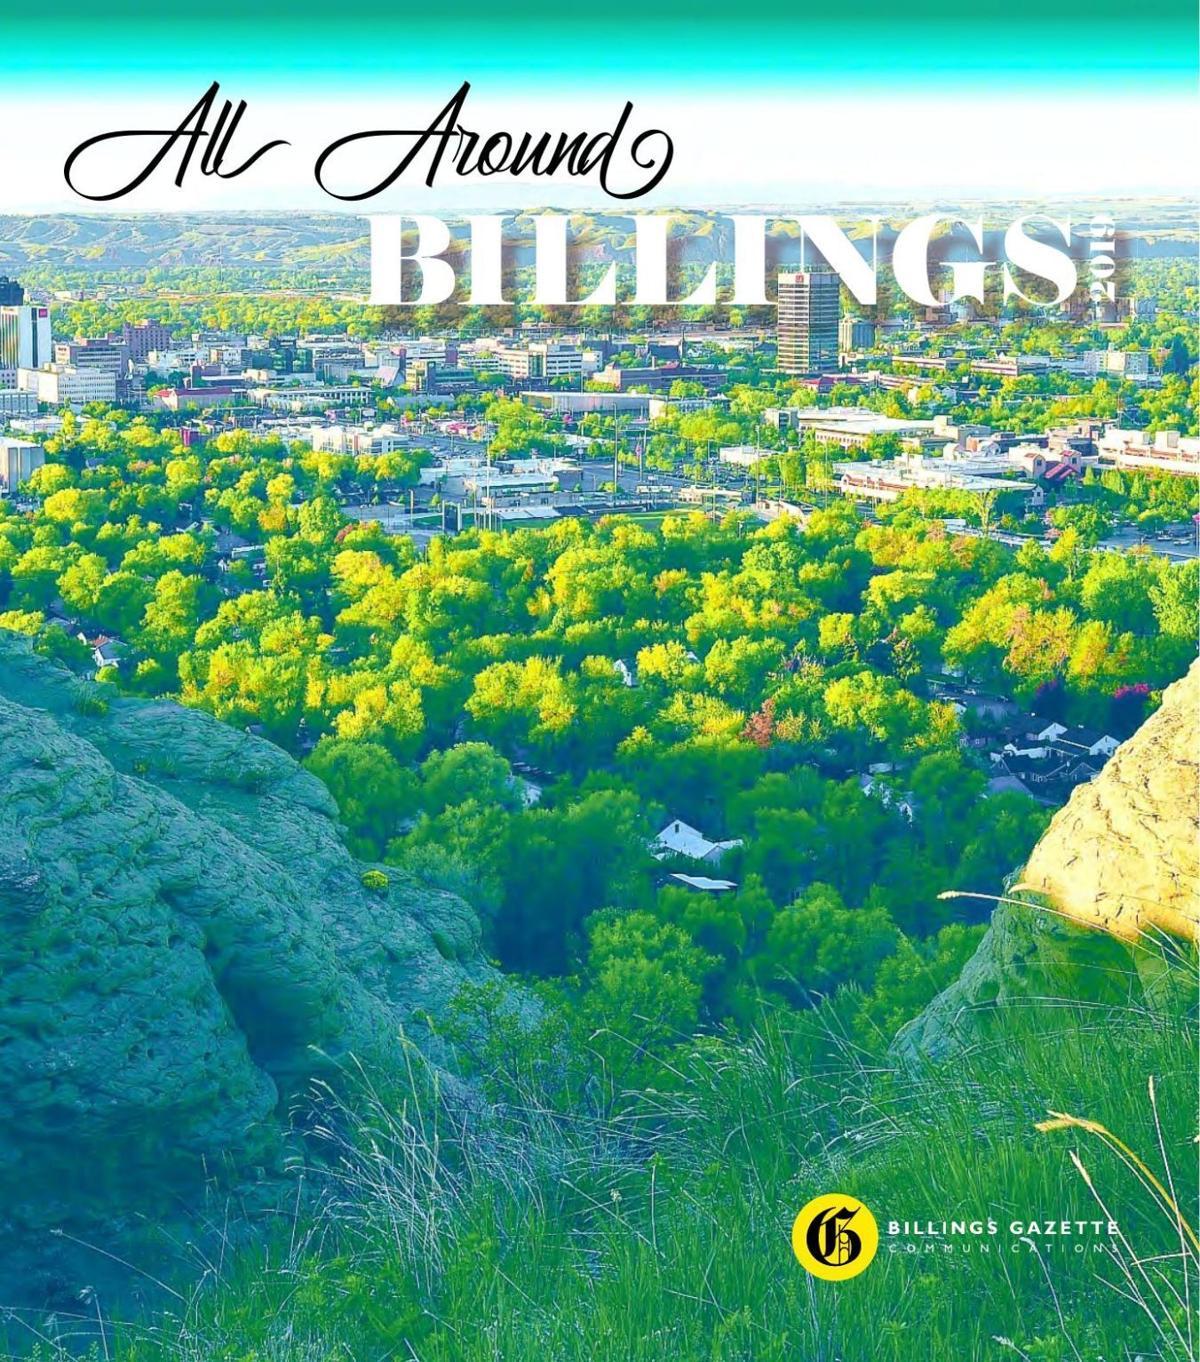 All Around Billings 2019